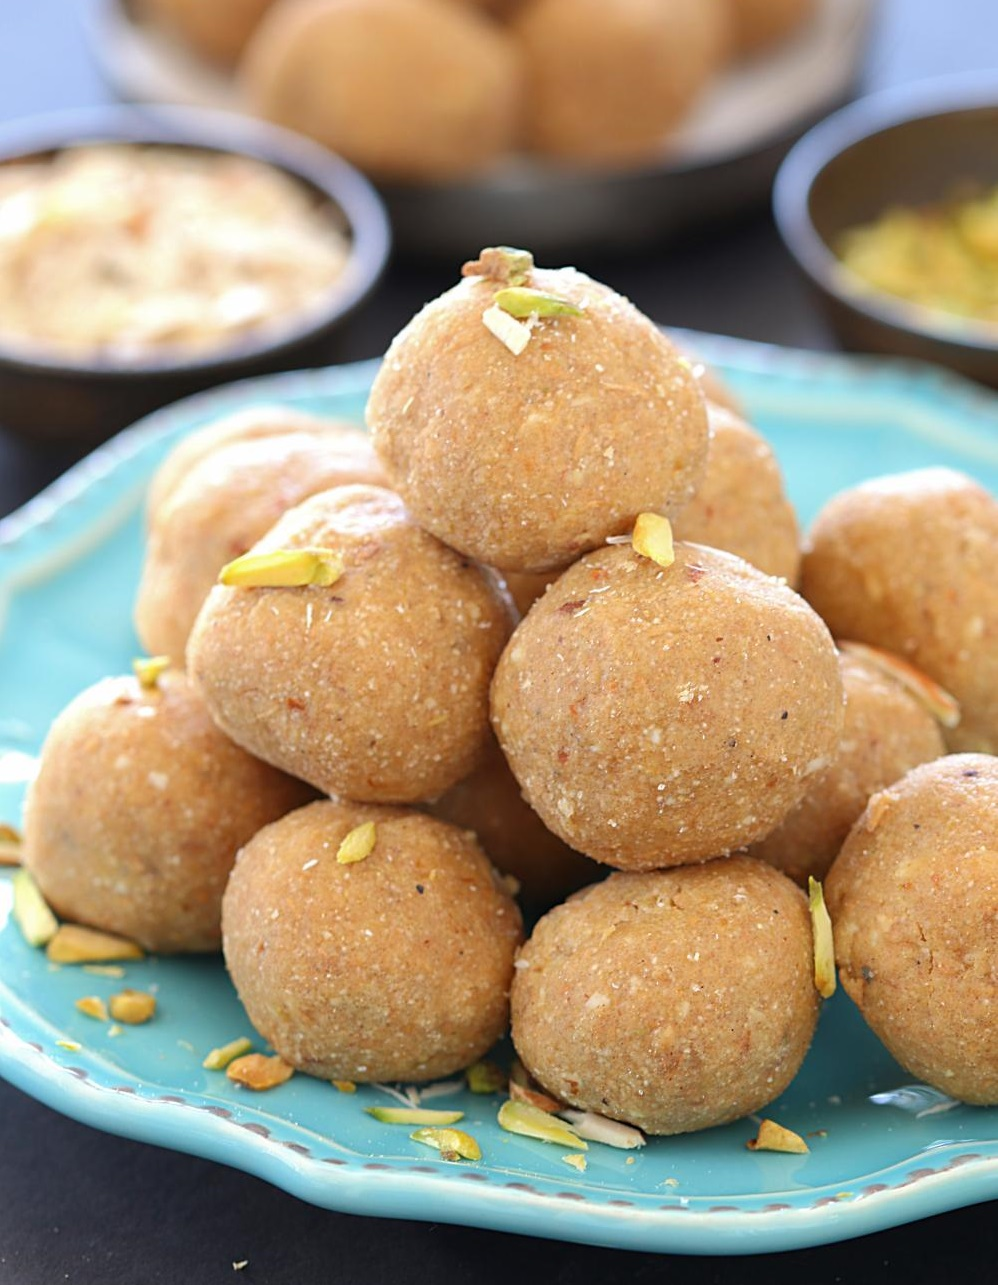 PunjabKesari, Aate Ki Pinni Image, Lohri Recipe Image